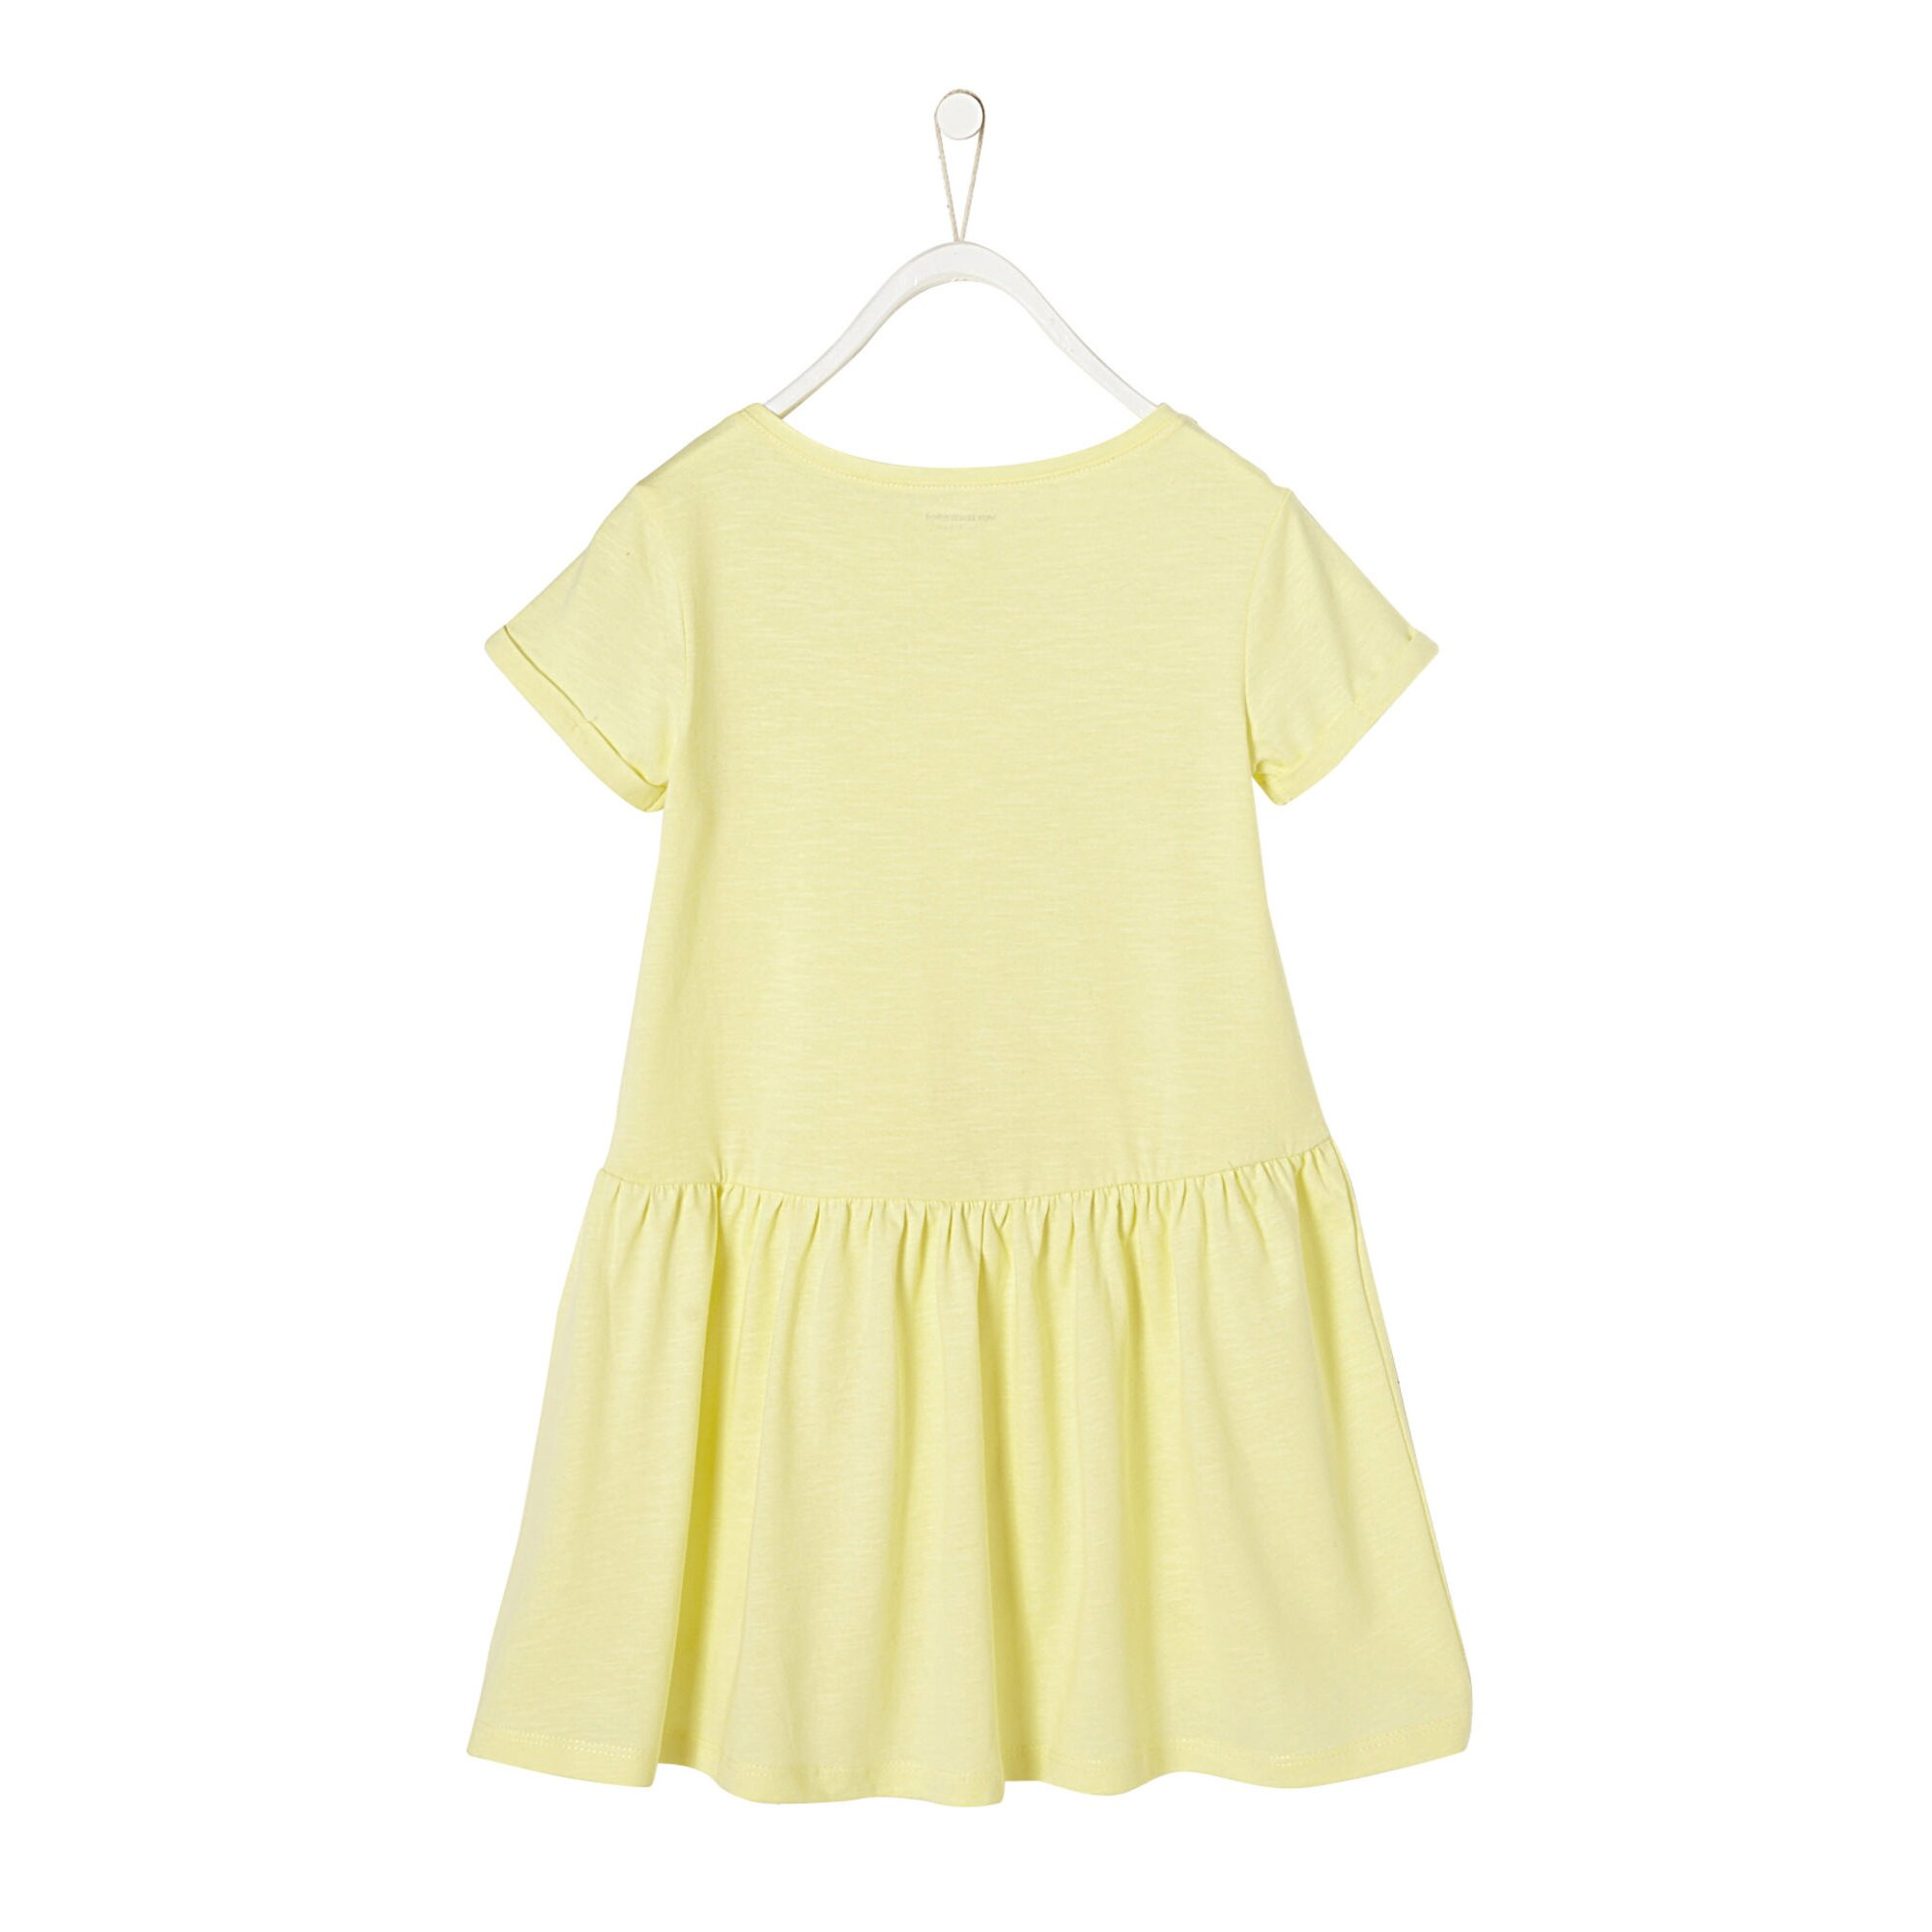 vertbaudet-madchen-jerseykleid, 13.99 EUR @ babywalz-de